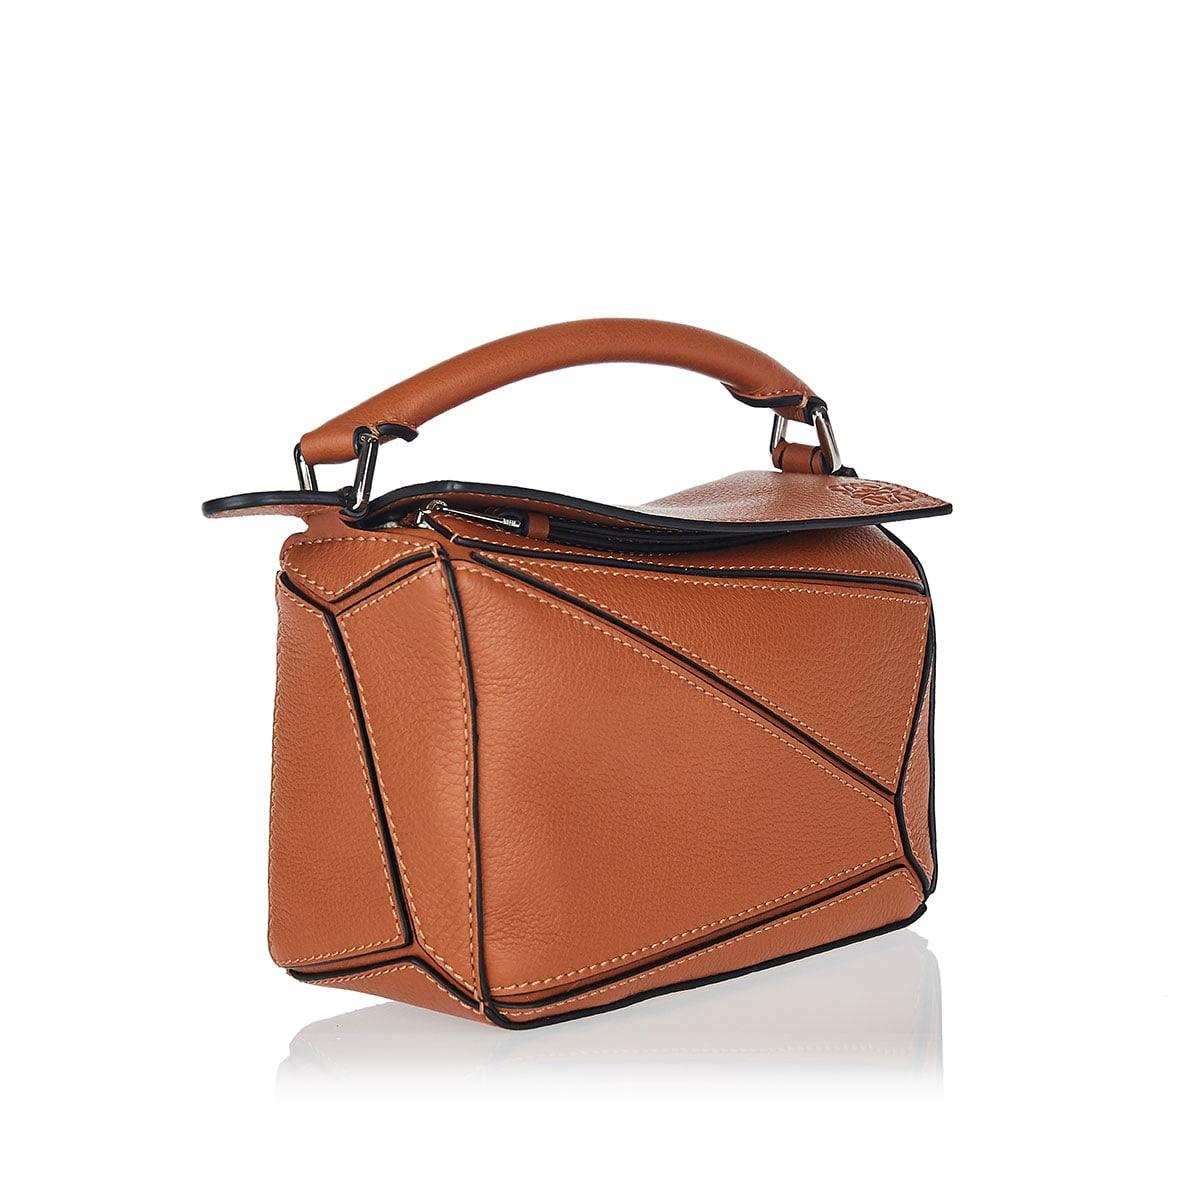 Puzzle mini leather bag